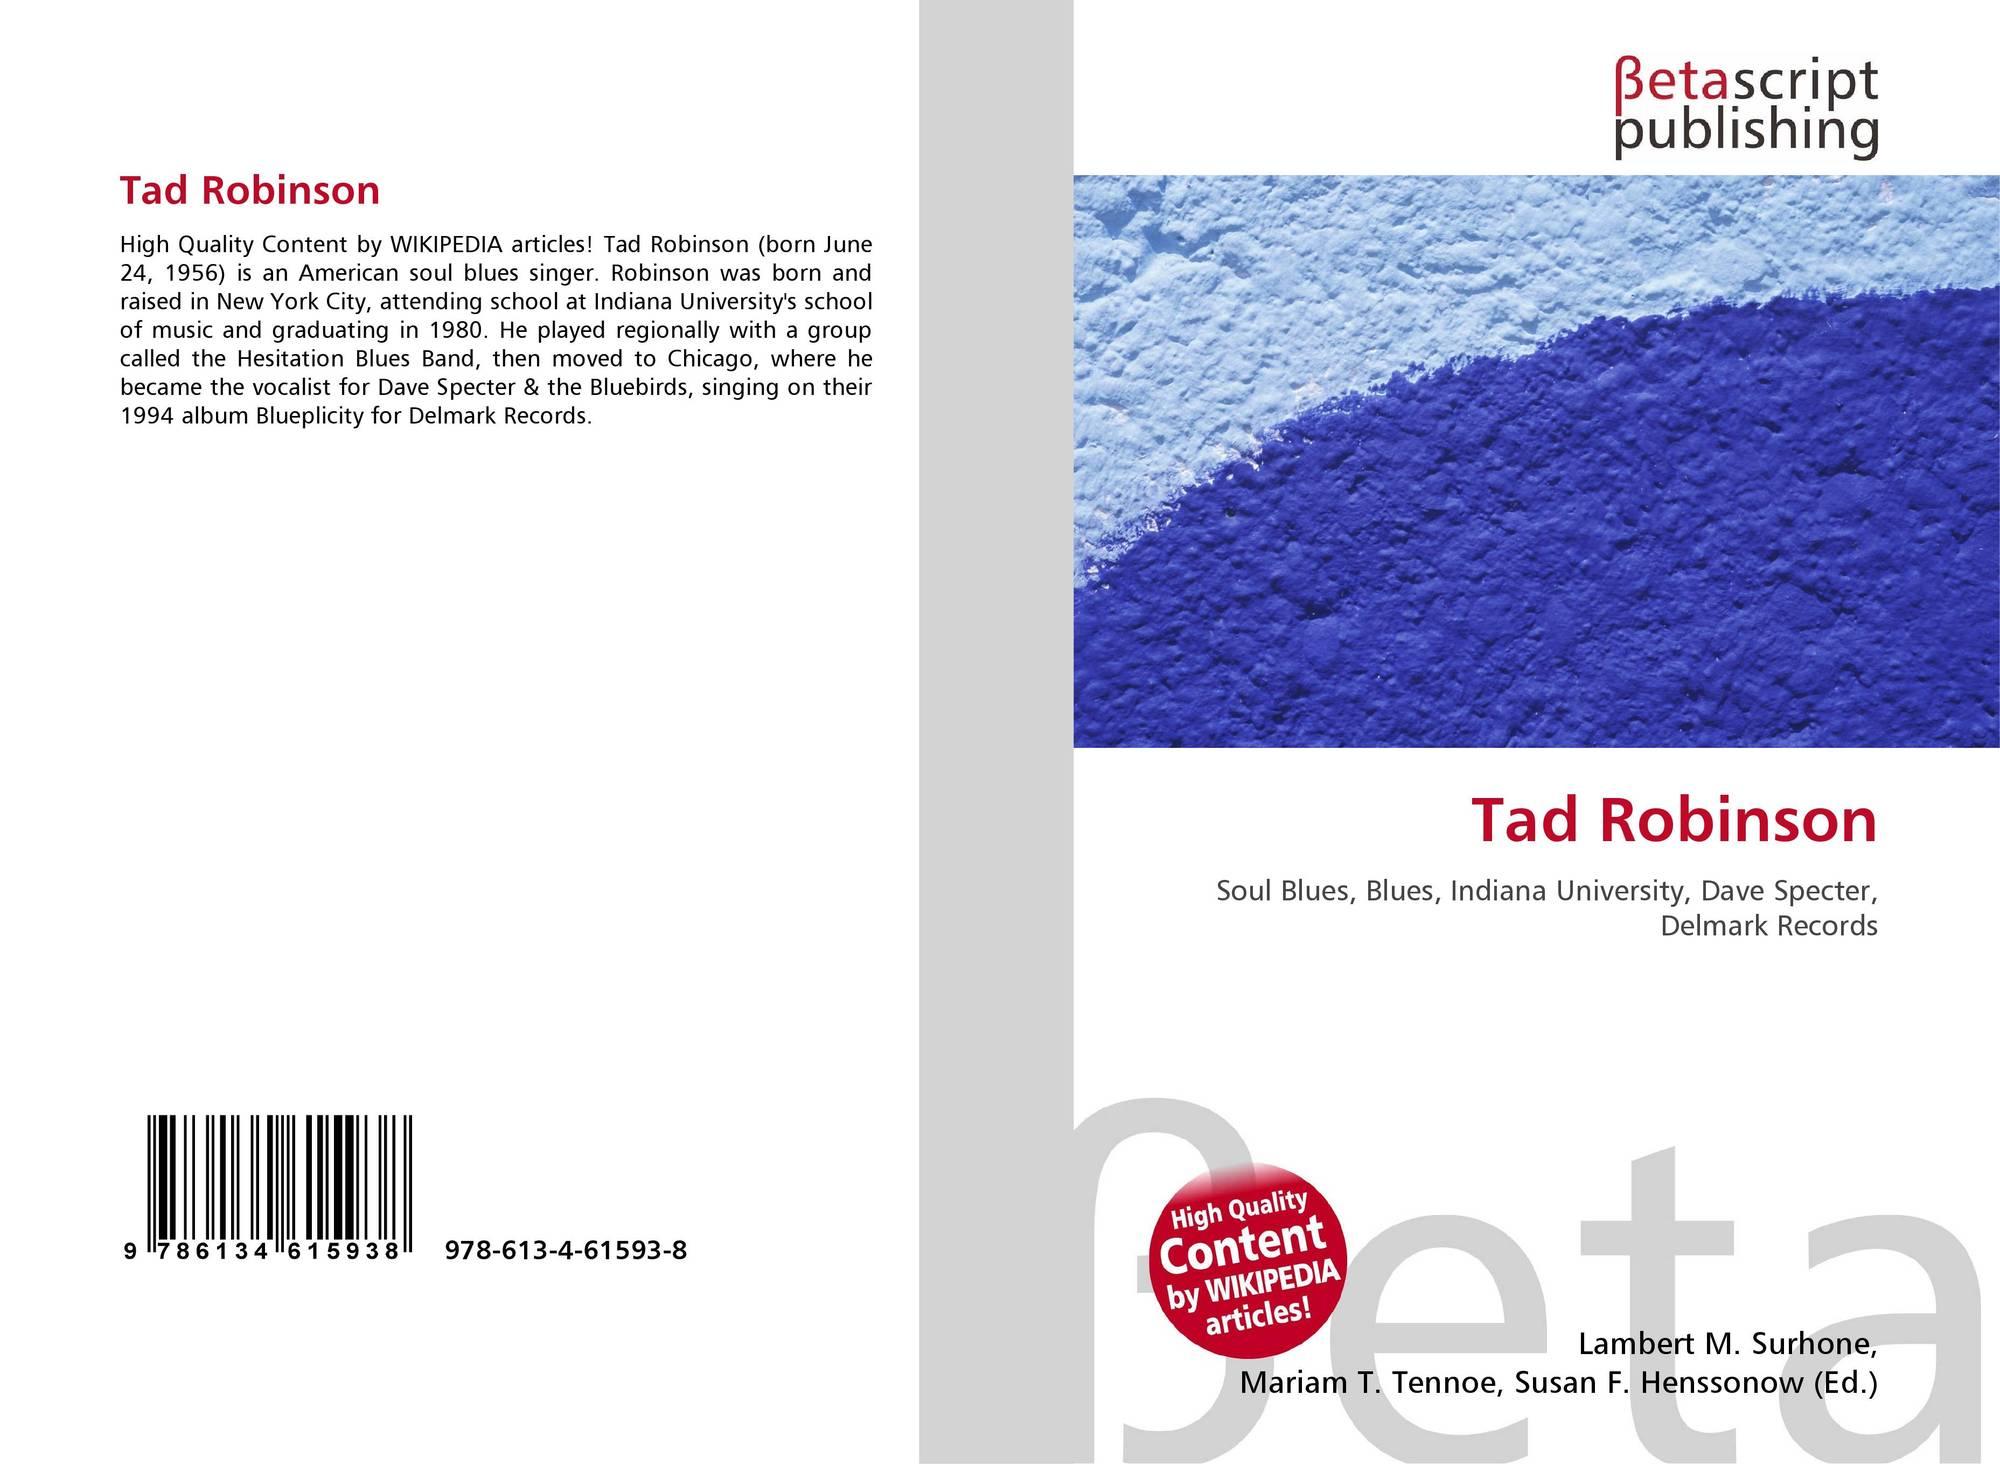 Tad Robinson, 978-613-4-61593-8, 6134615935 ,9786134615938